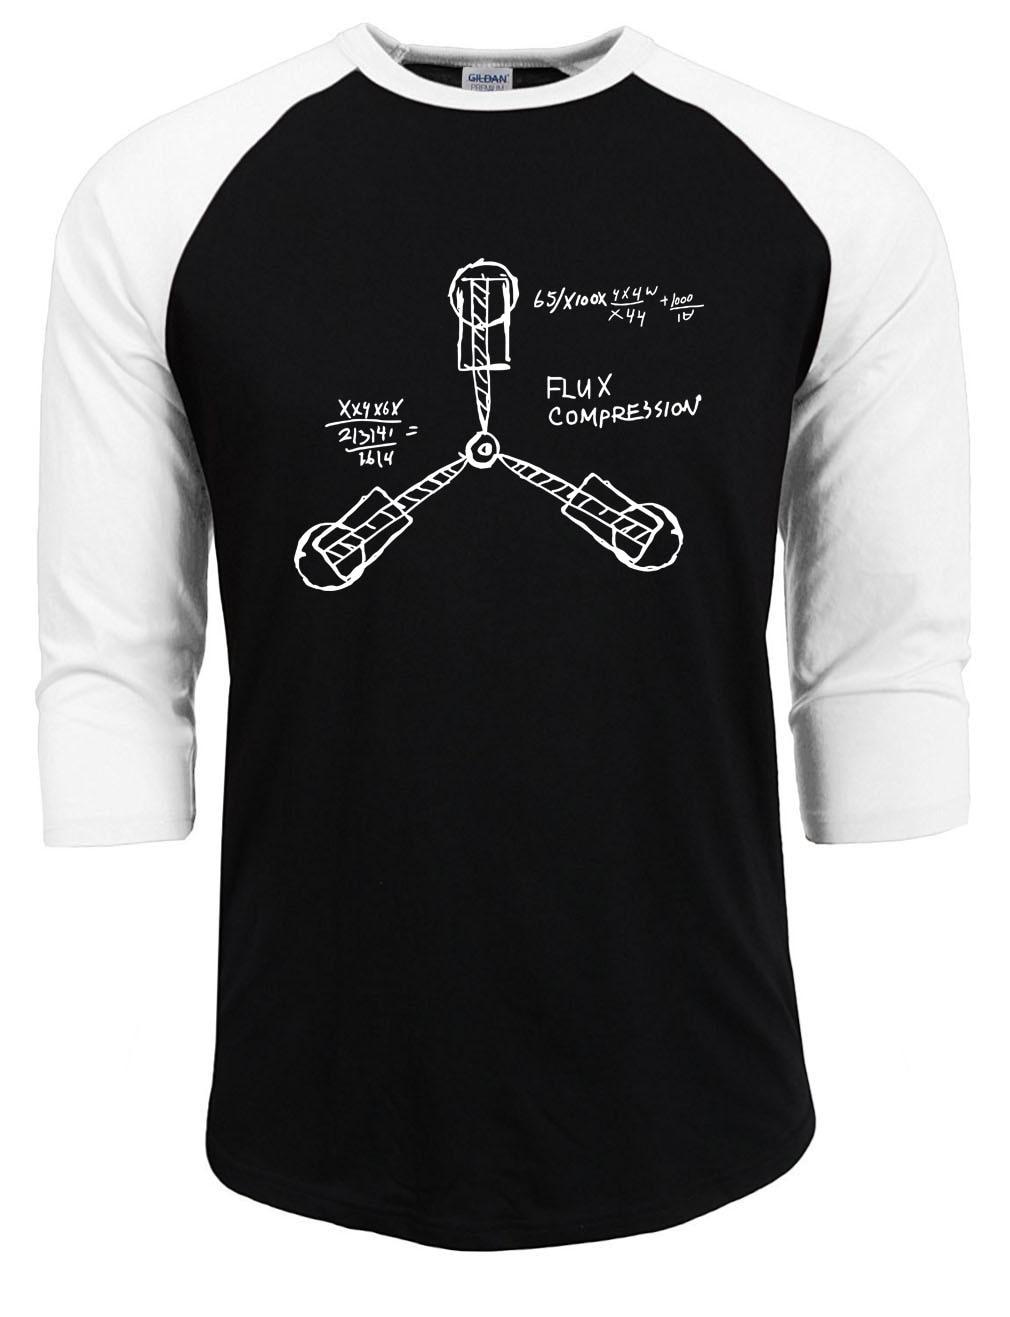 New Stylish Mens T Shirts Back to the Future shirts 100% Cotton Raglan Sleeve Casual Tops Tees Bodybuilding funny t shirt men